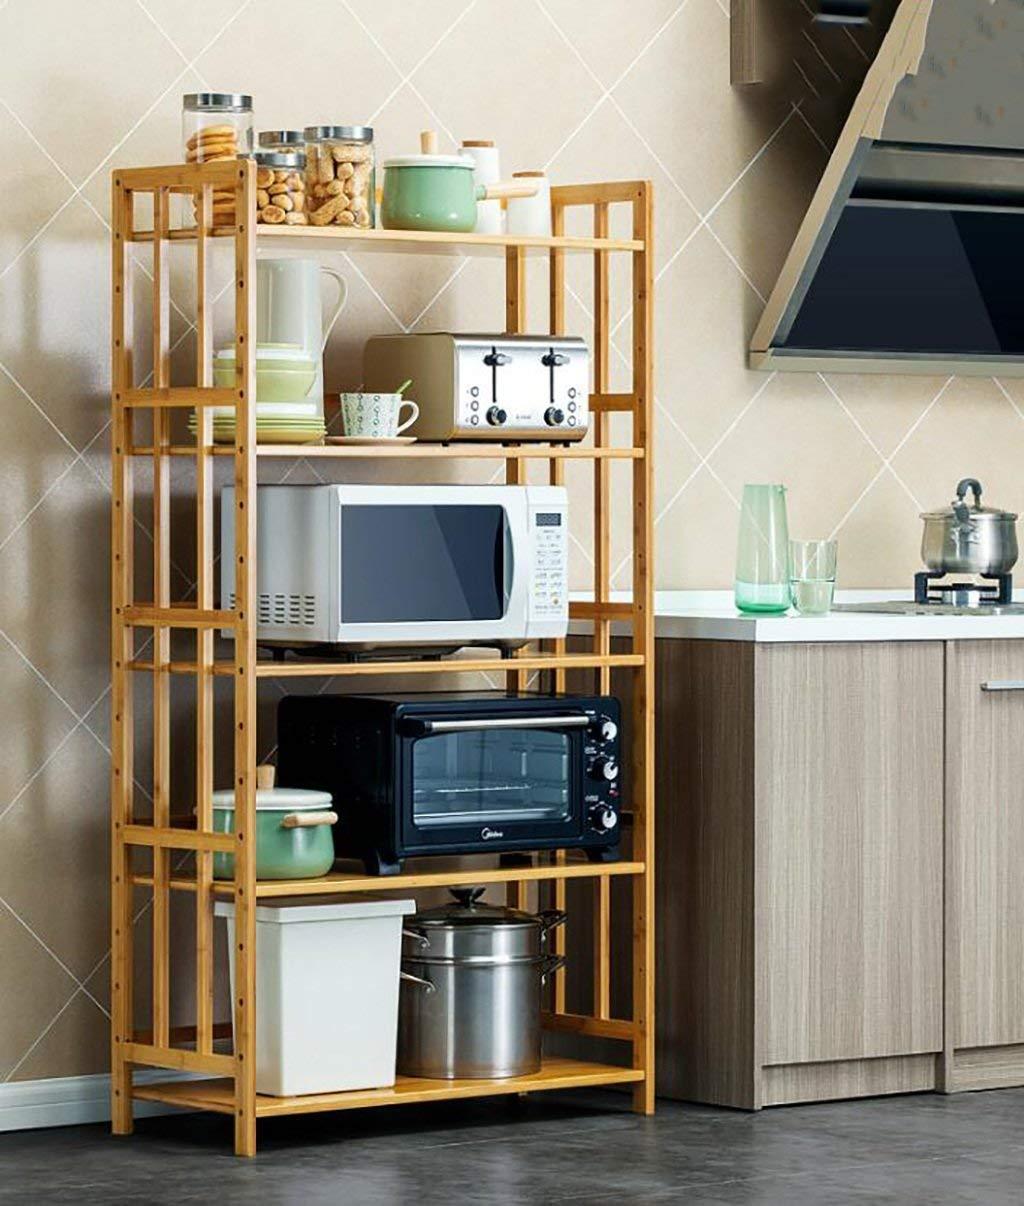 size: 80 * 38 * 153CM Color : -, Size : - kitchen storage racks FuweiEncore Kitchen shelf Kitchen Shelf Floor Microwave Oven Shelf 5-storey kitchen warehousing rack rack oven bamboo